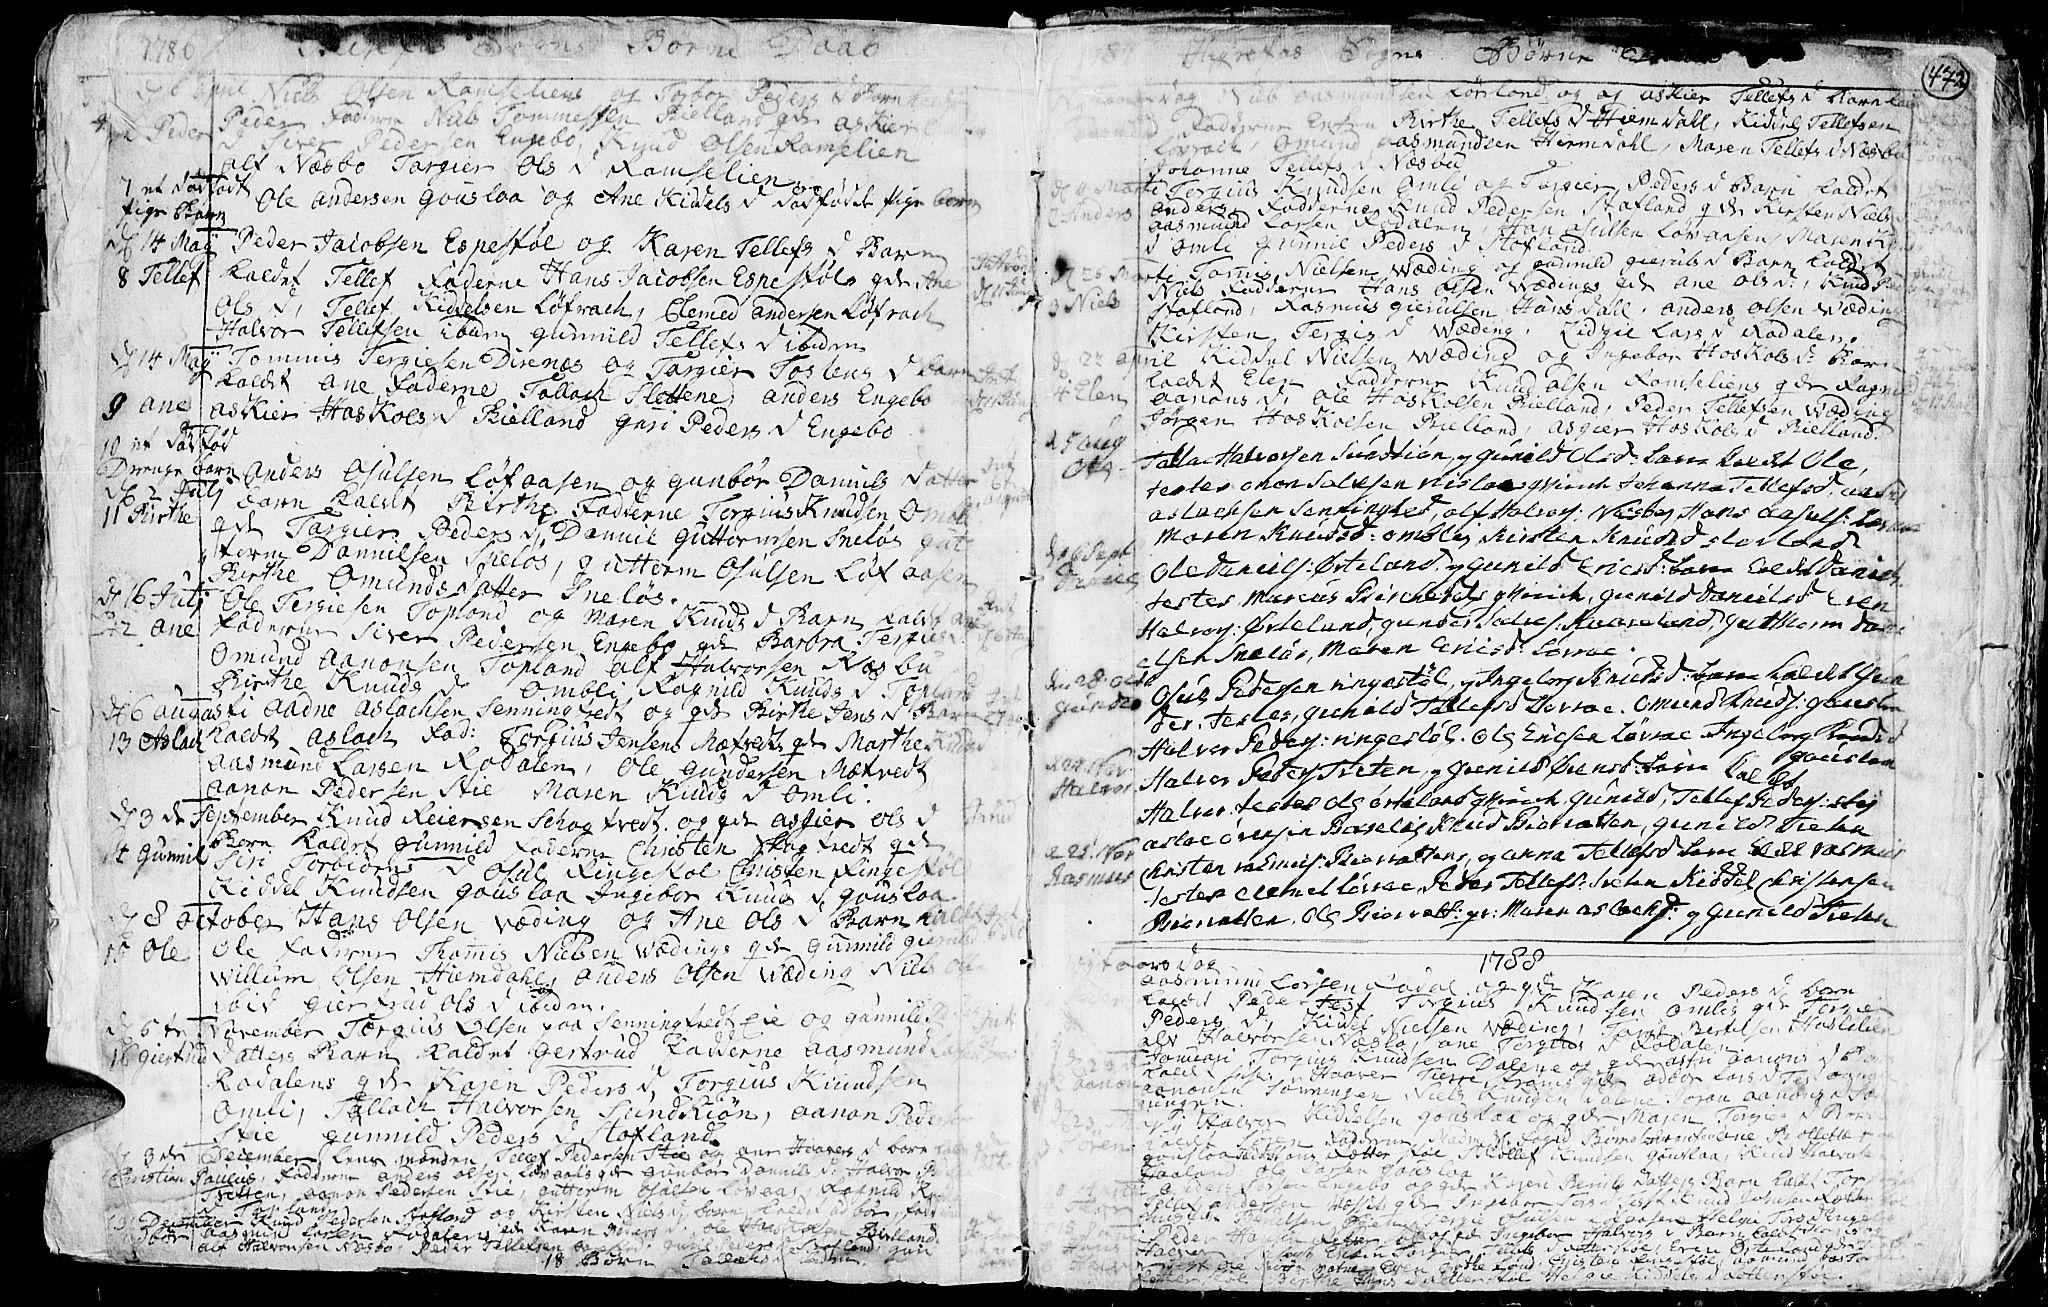 SAK, Hommedal sokneprestkontor, F/Fa/Fab/L0002: Ministerialbok nr. A 2 /3, 1740-1821, s. 472